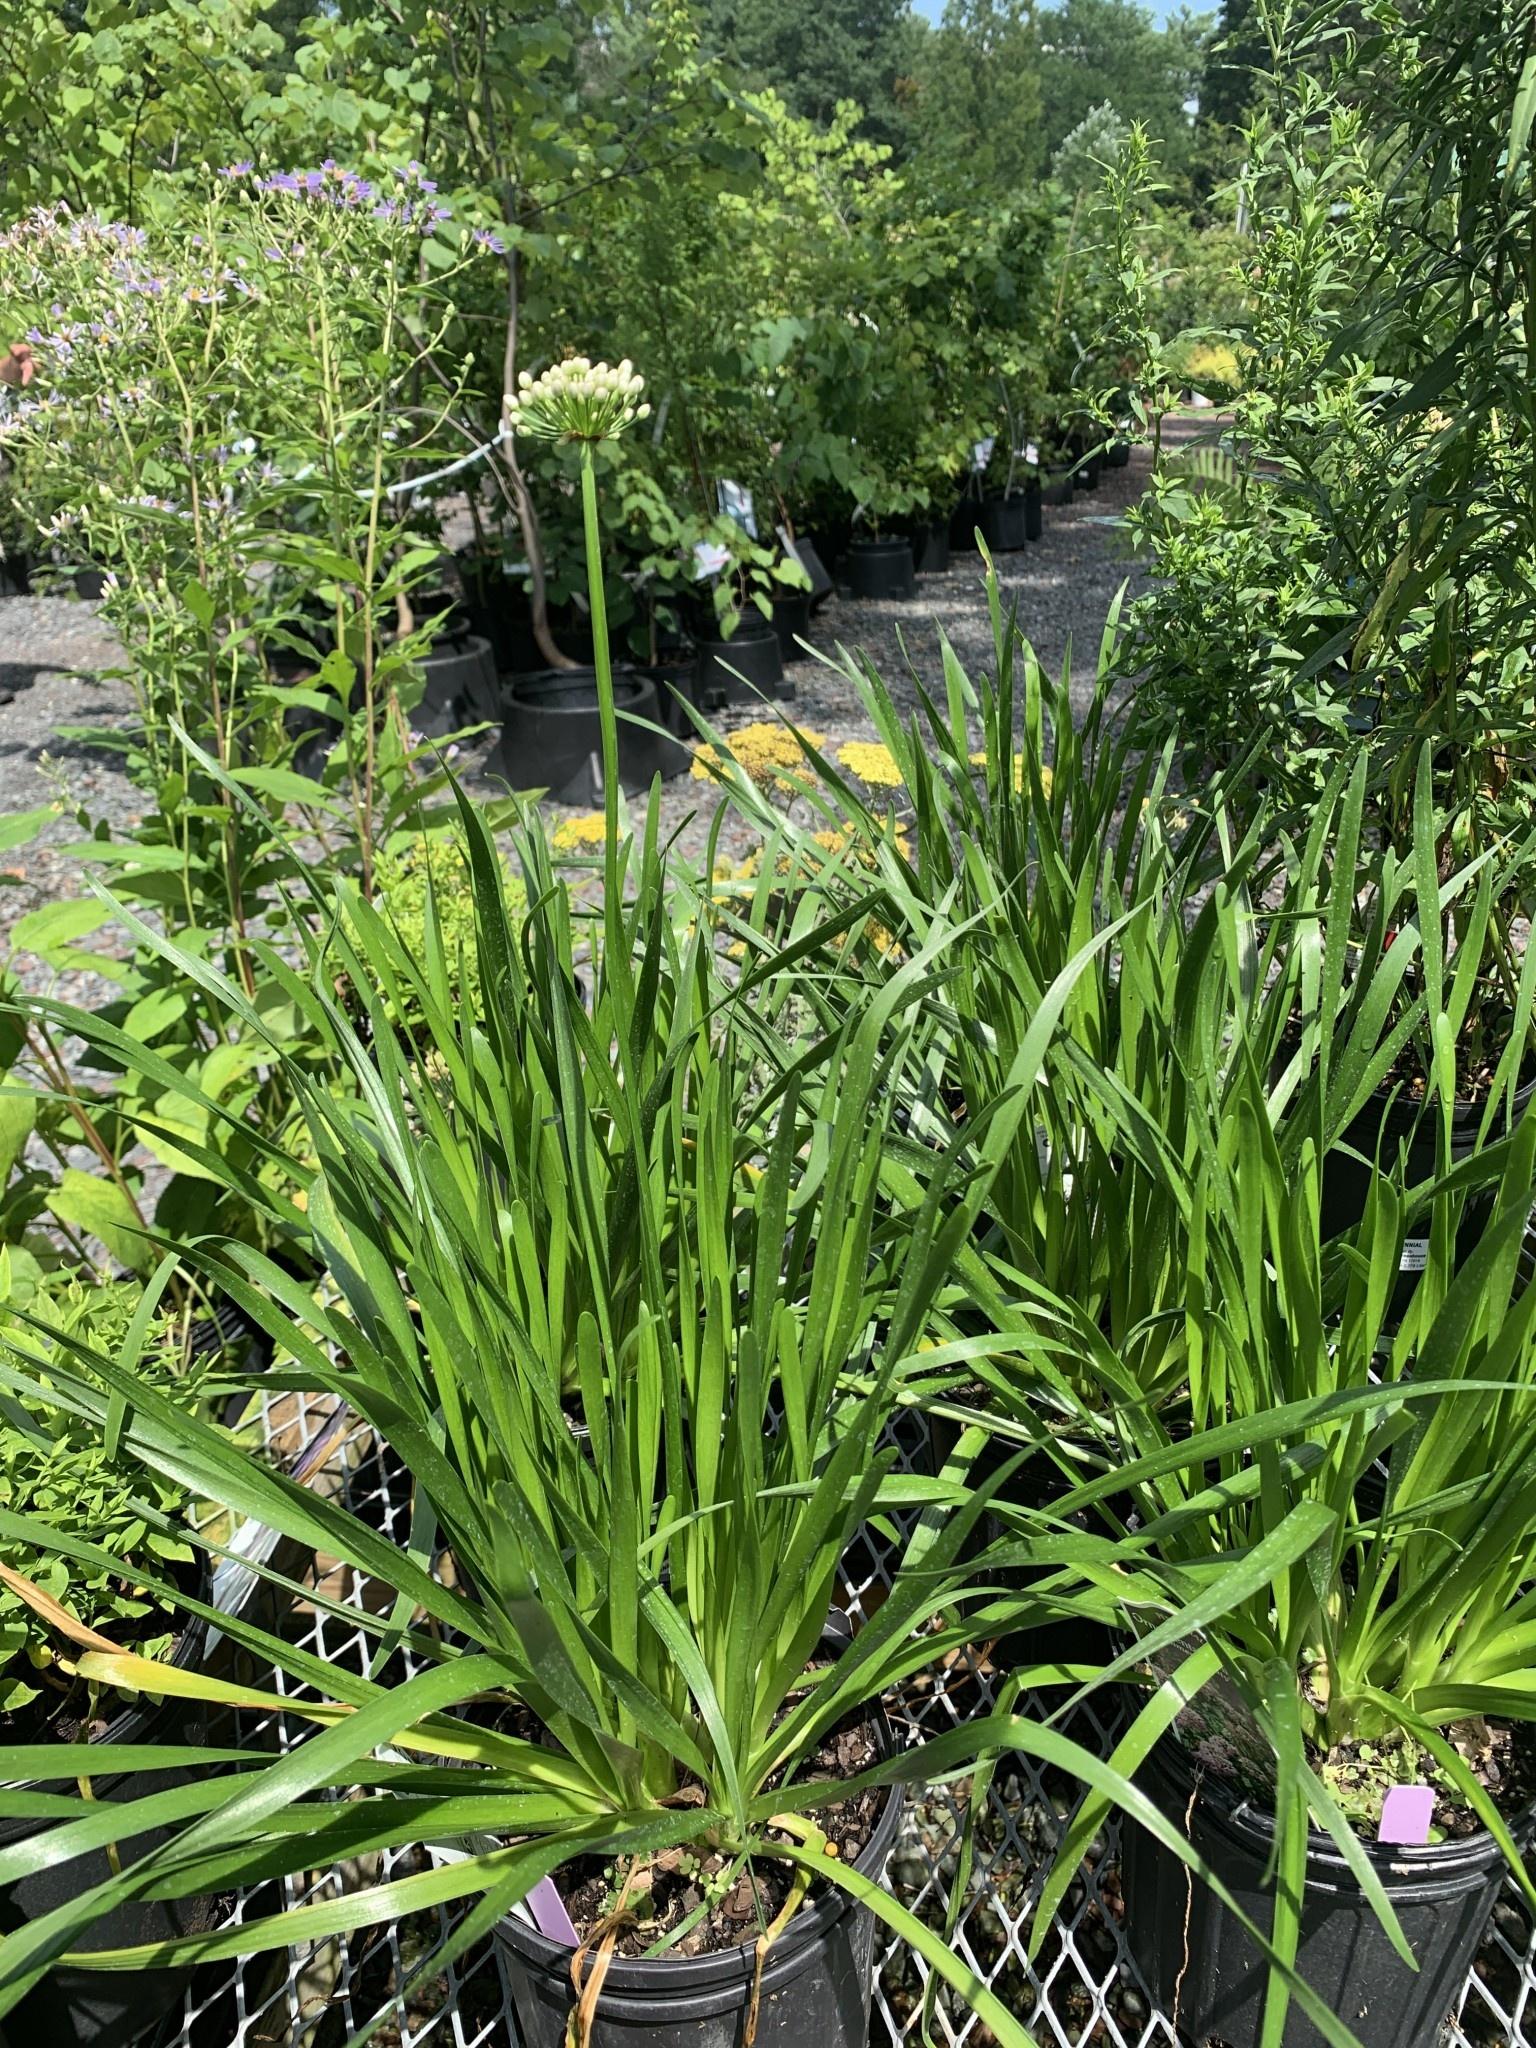 New Allium Summer Beauty, Ornamental Onion #1